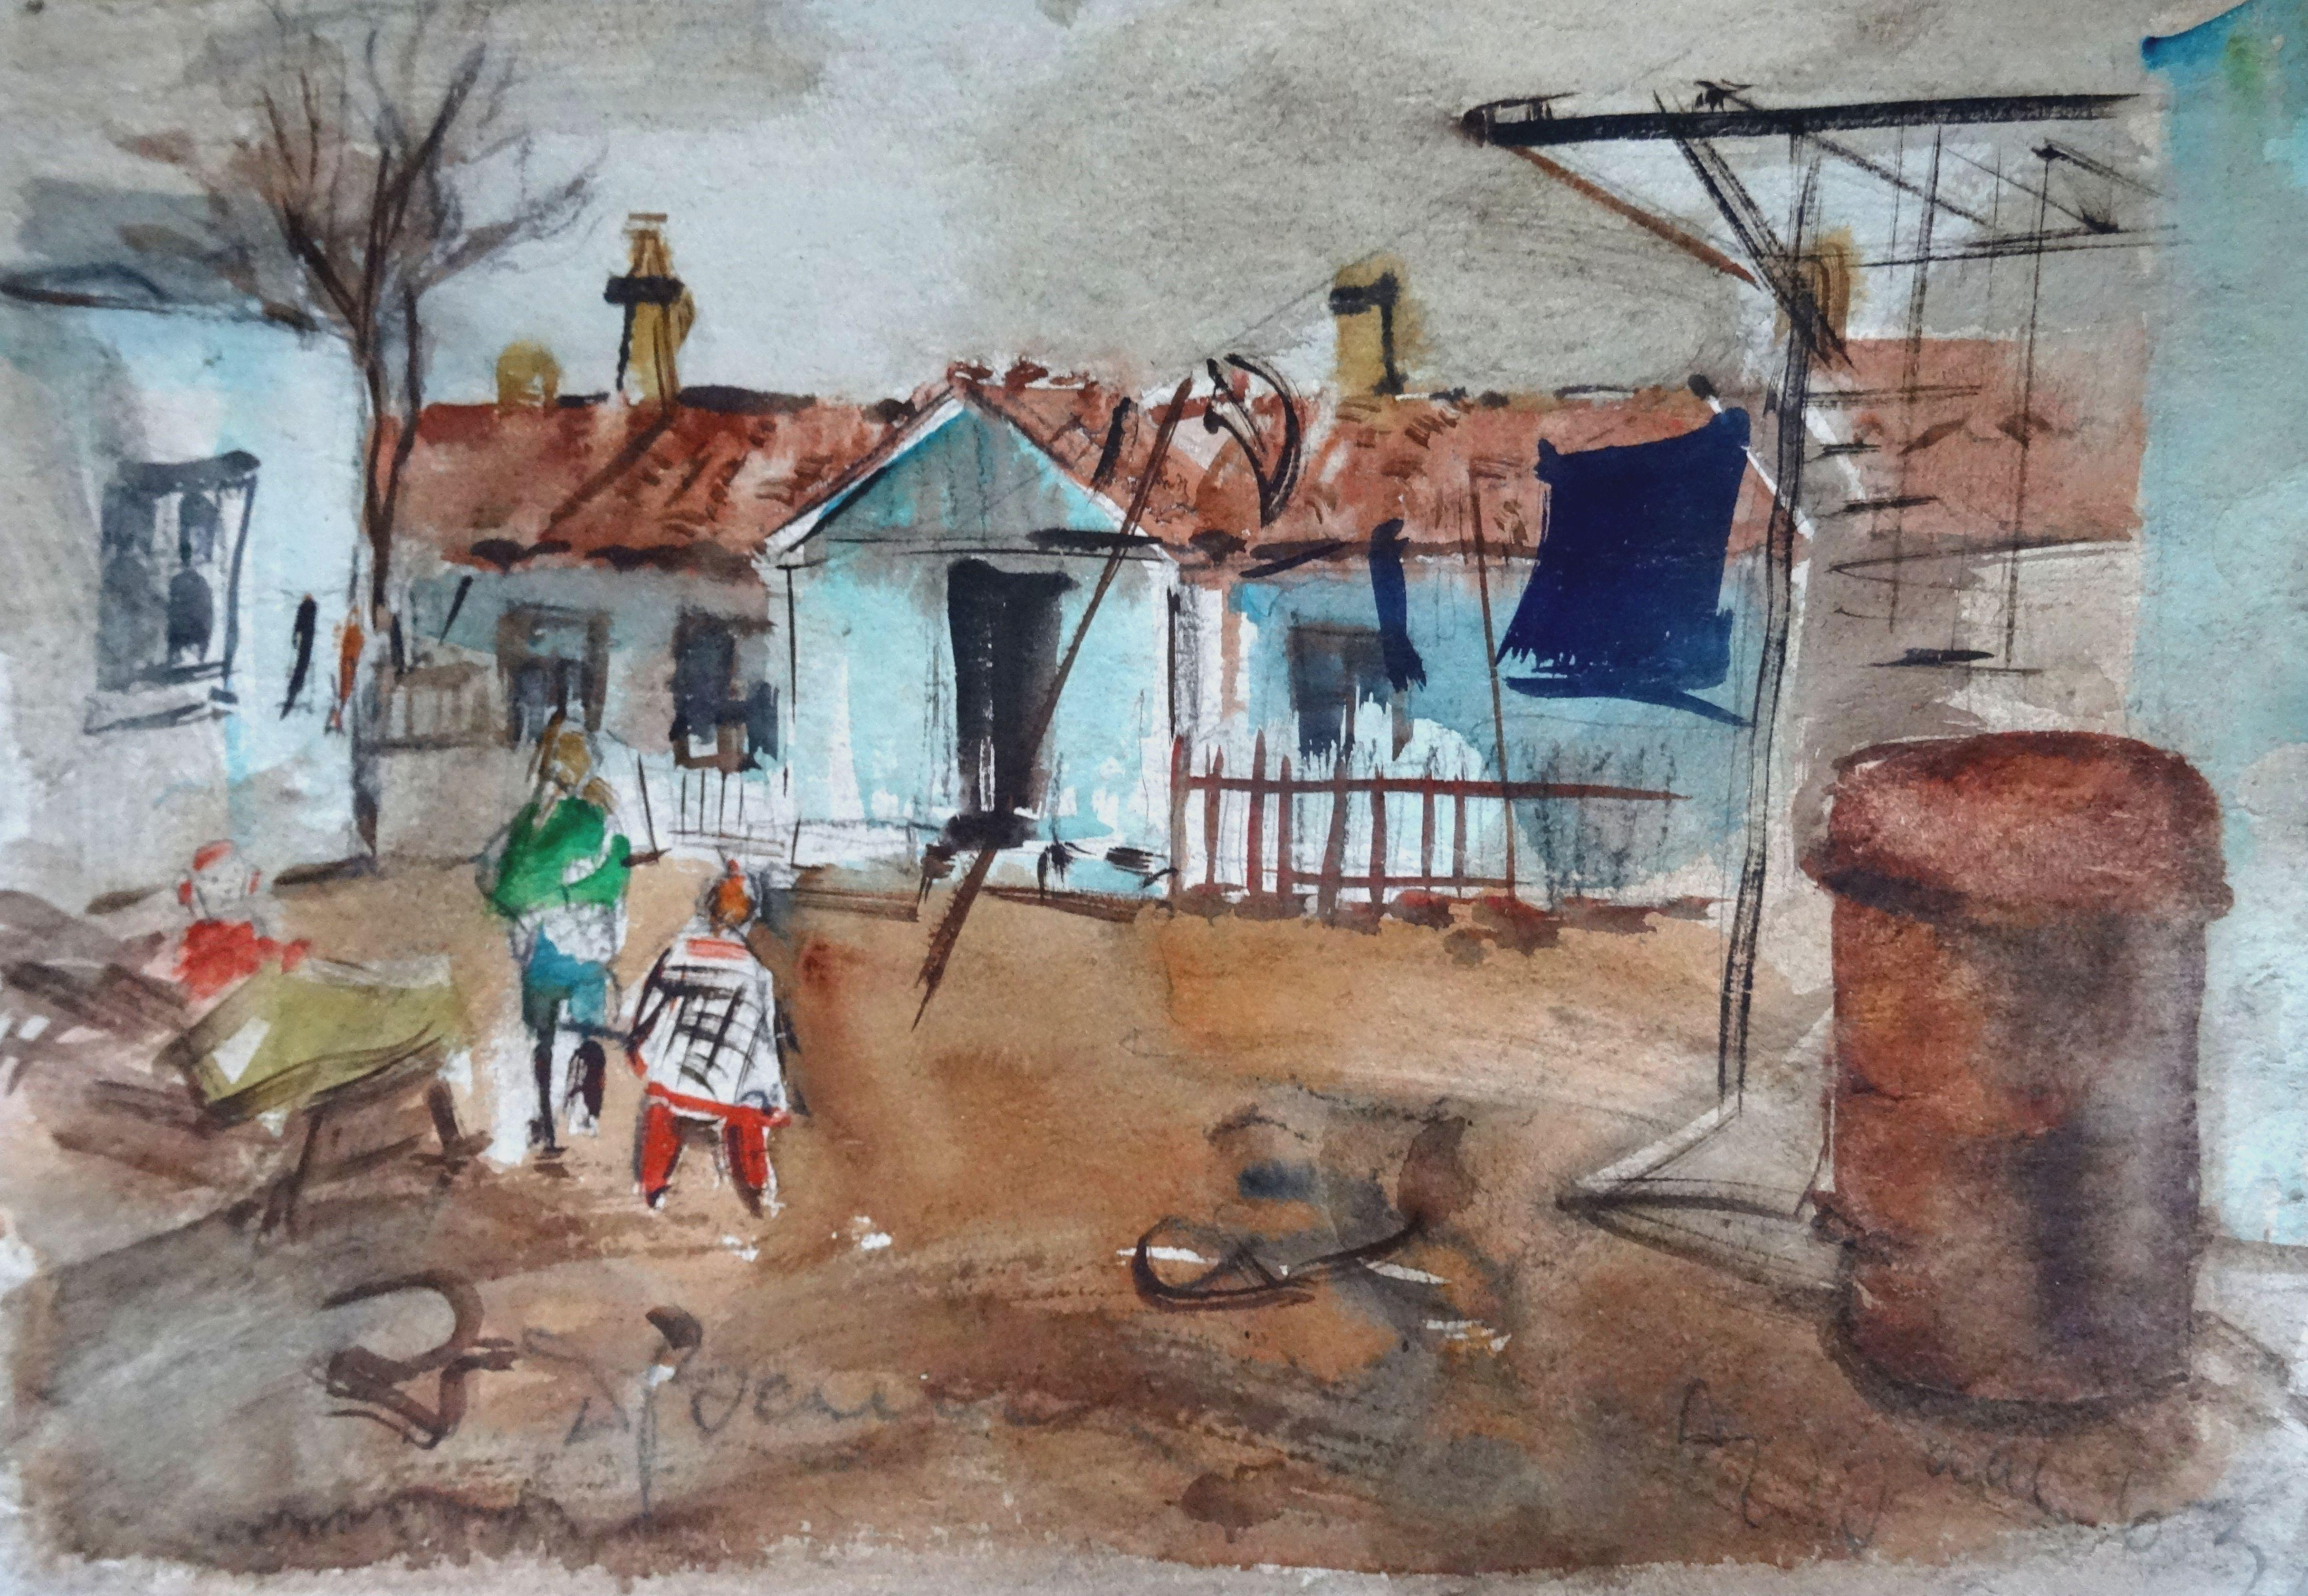 Suburb. 1963, watercolor on paper, 27x38 cm